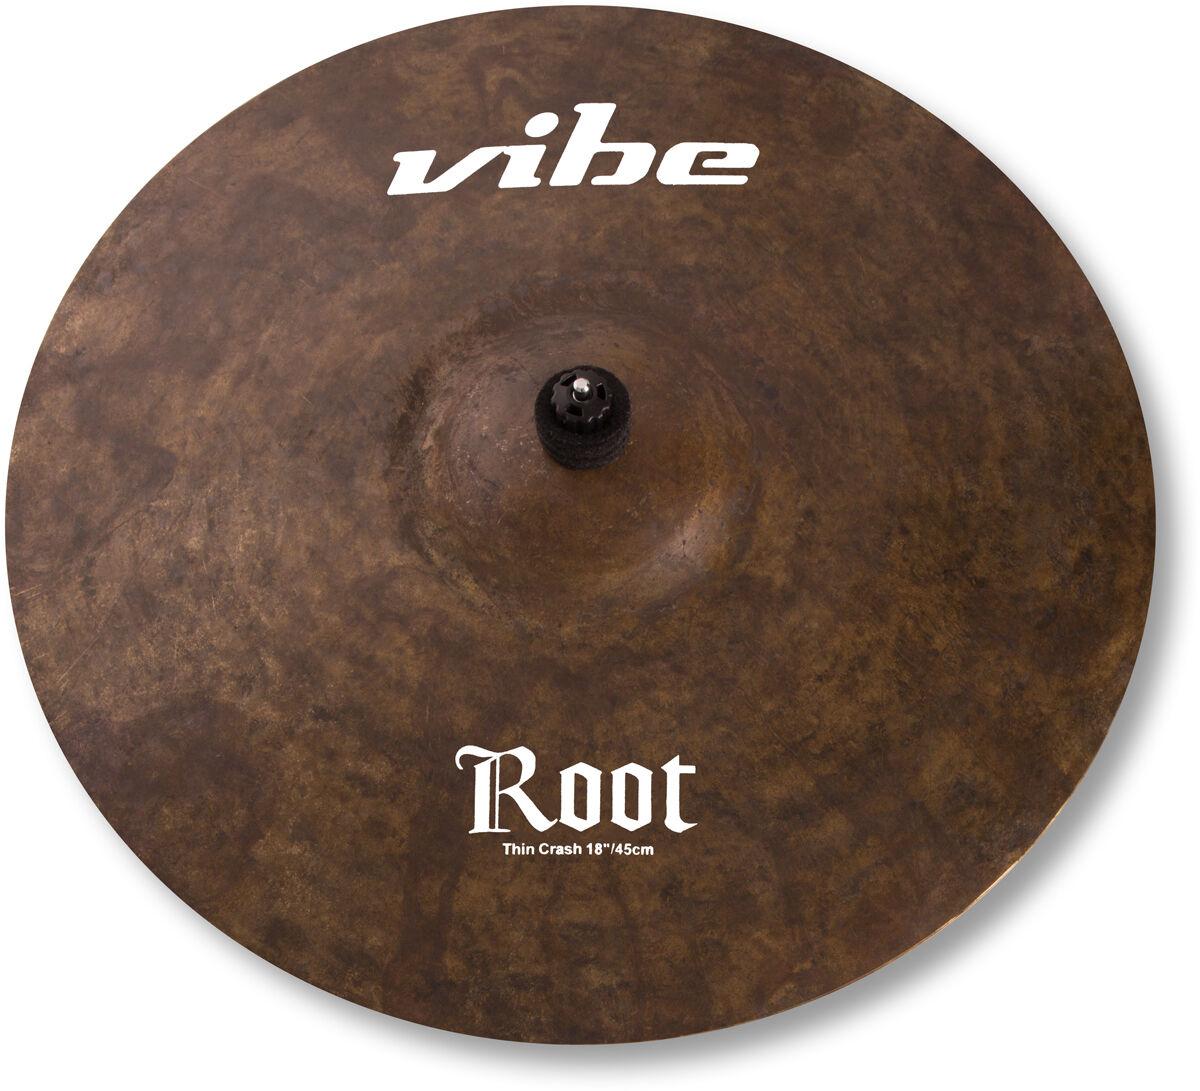 Vibe Crash Becken 18 , Handgehämmert aus B20, Serie wählbar, 18  Crash Cymbal